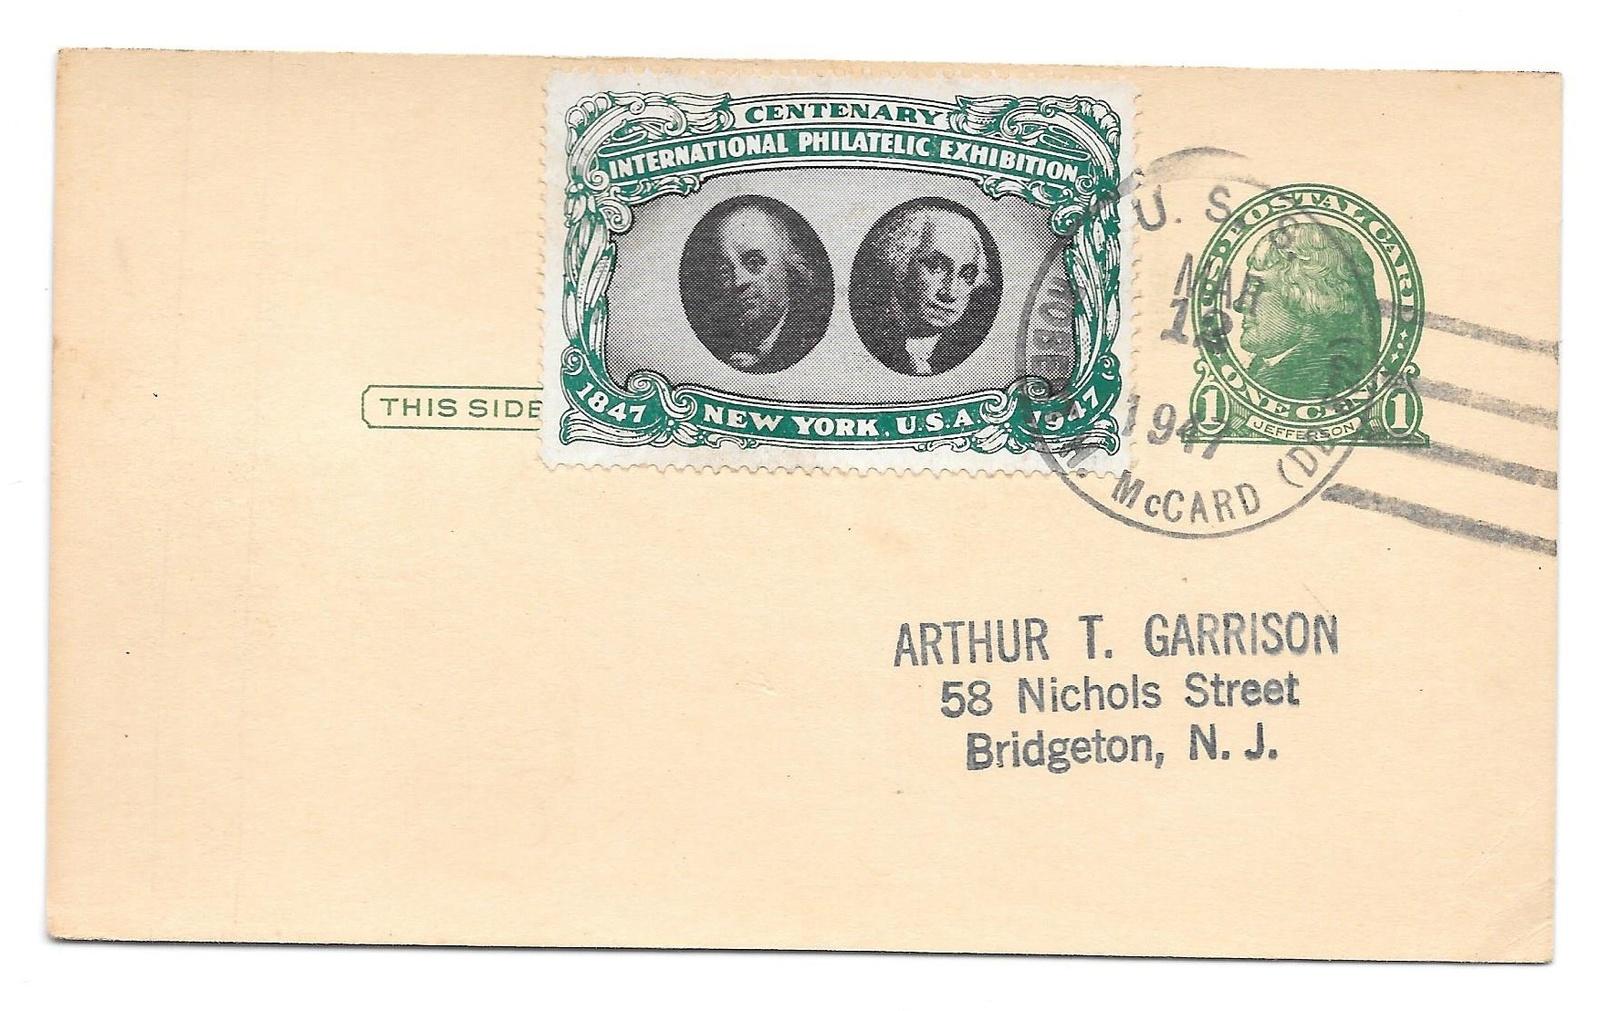 Navy Ship Cancel 1947 USS Robert H McCard CIPEX Poster Stamp Cinderela Tied UX27 - $9.95